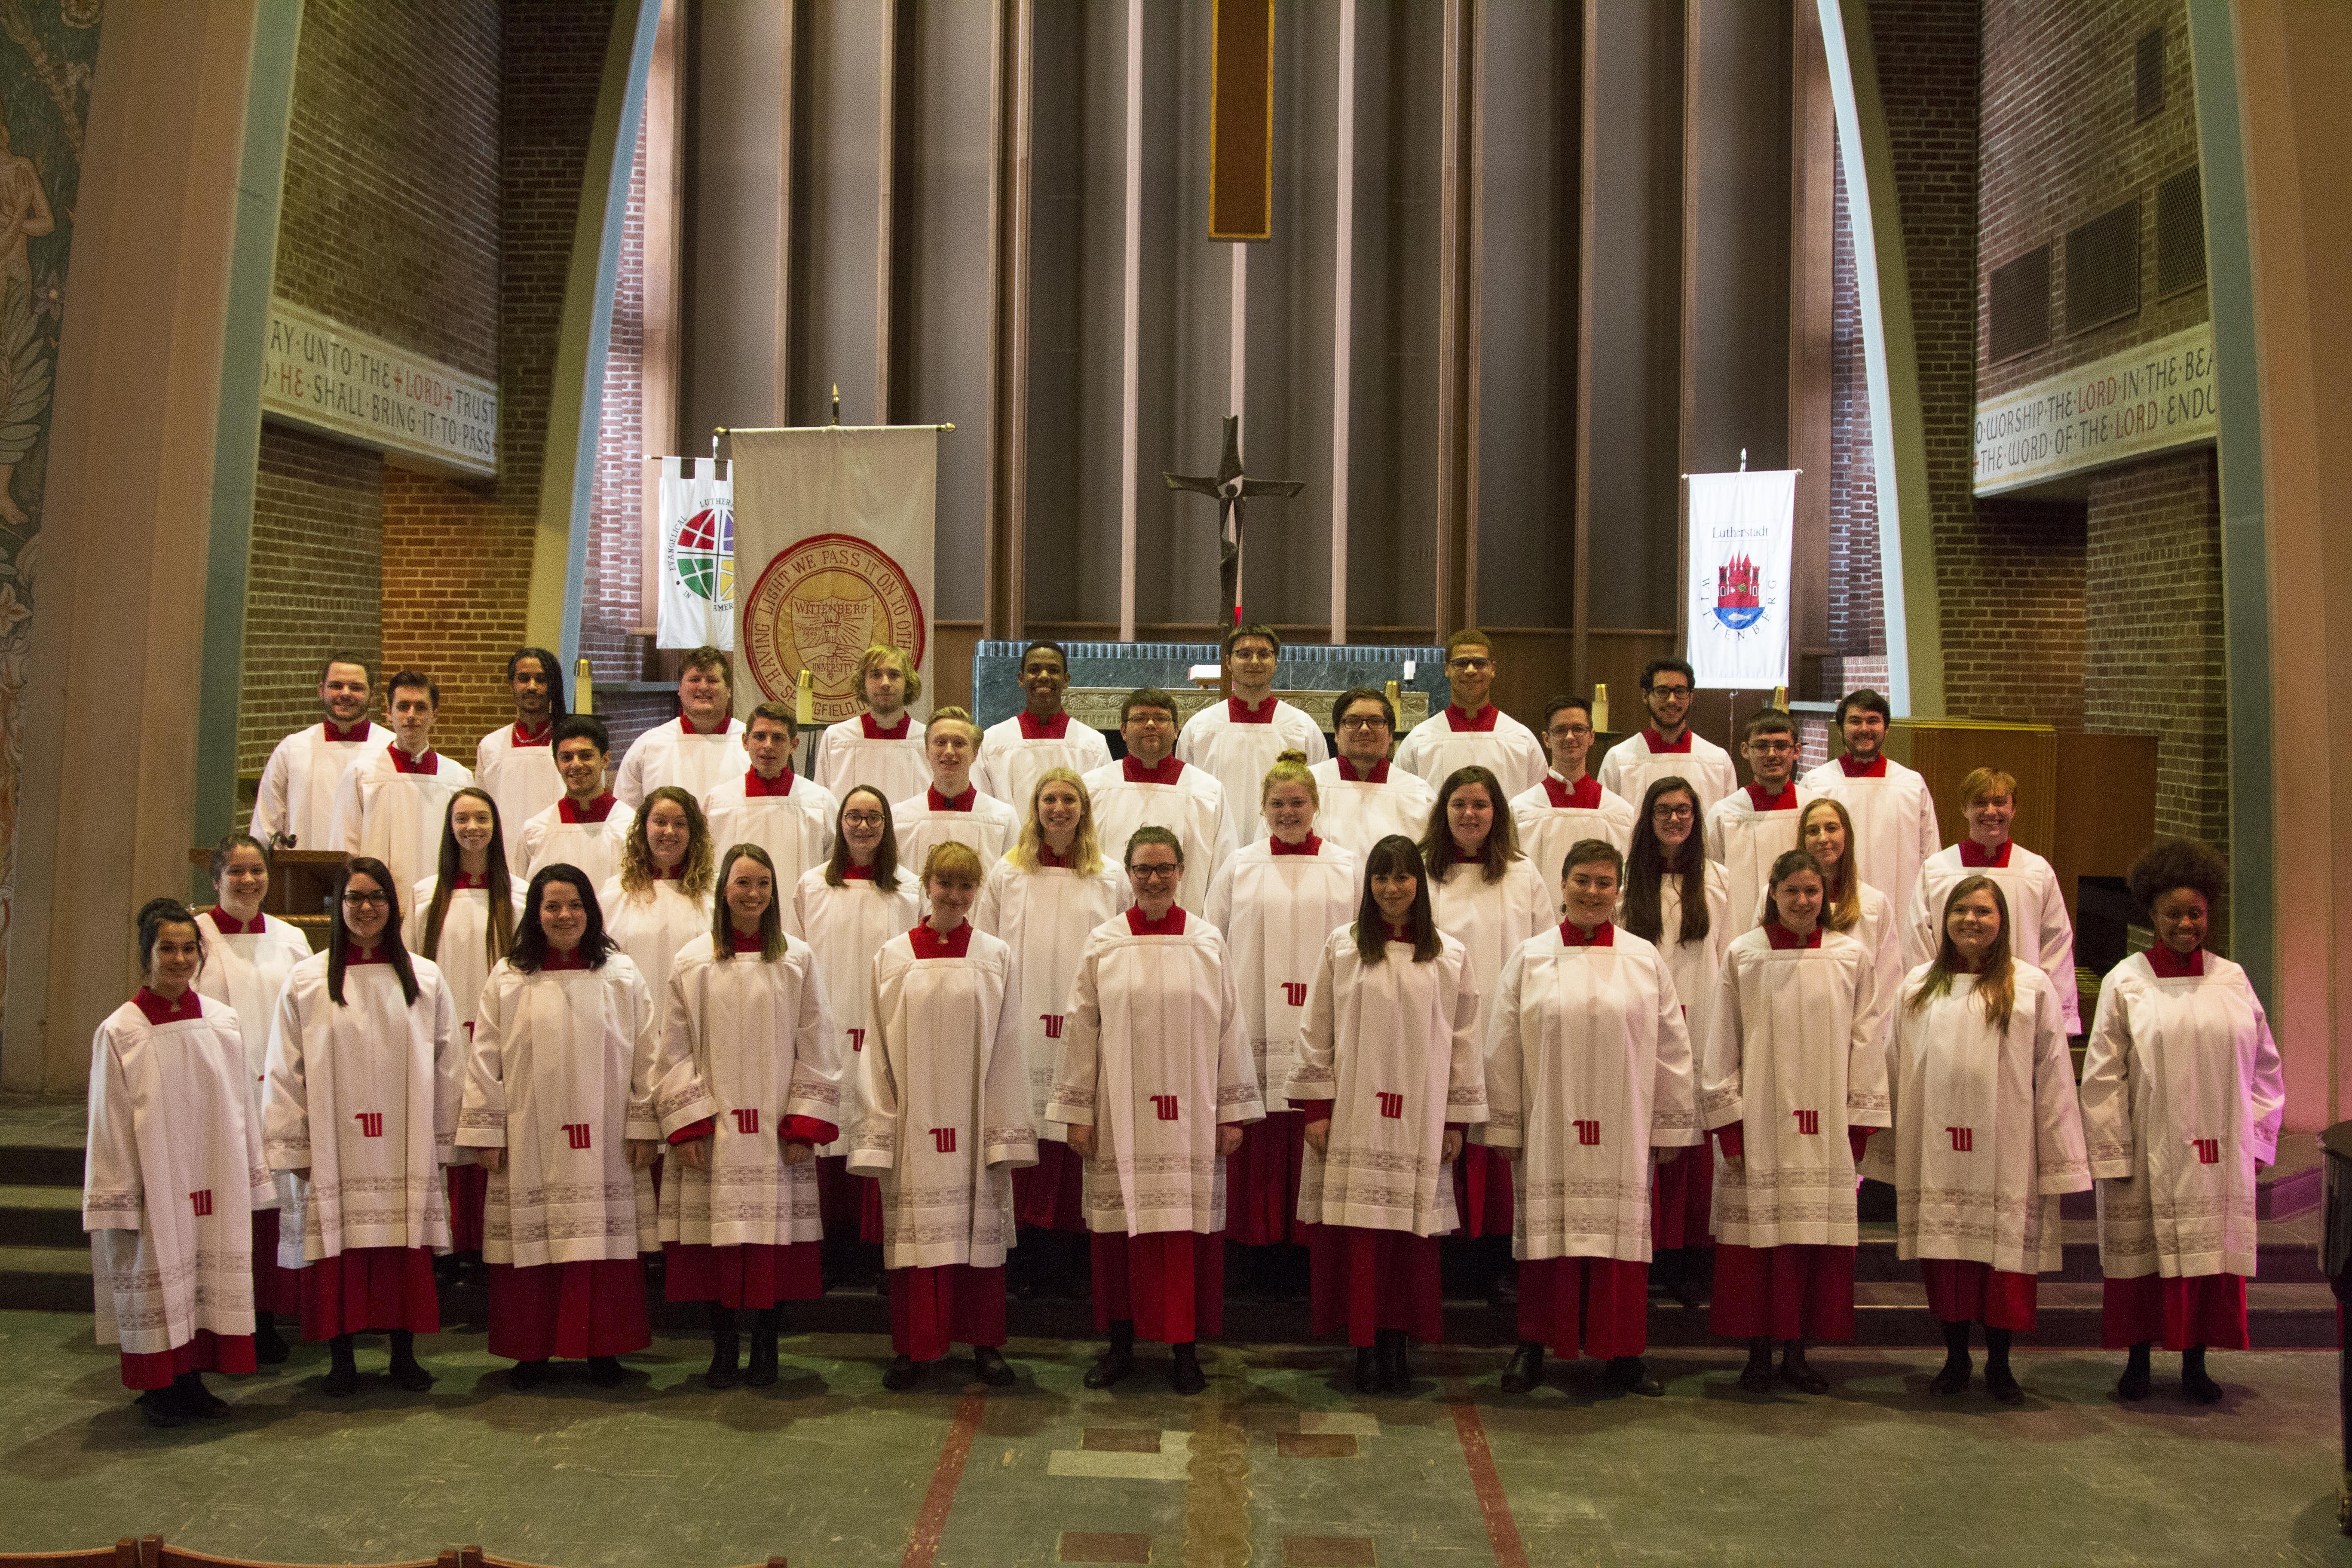 Wittenberg University Choir